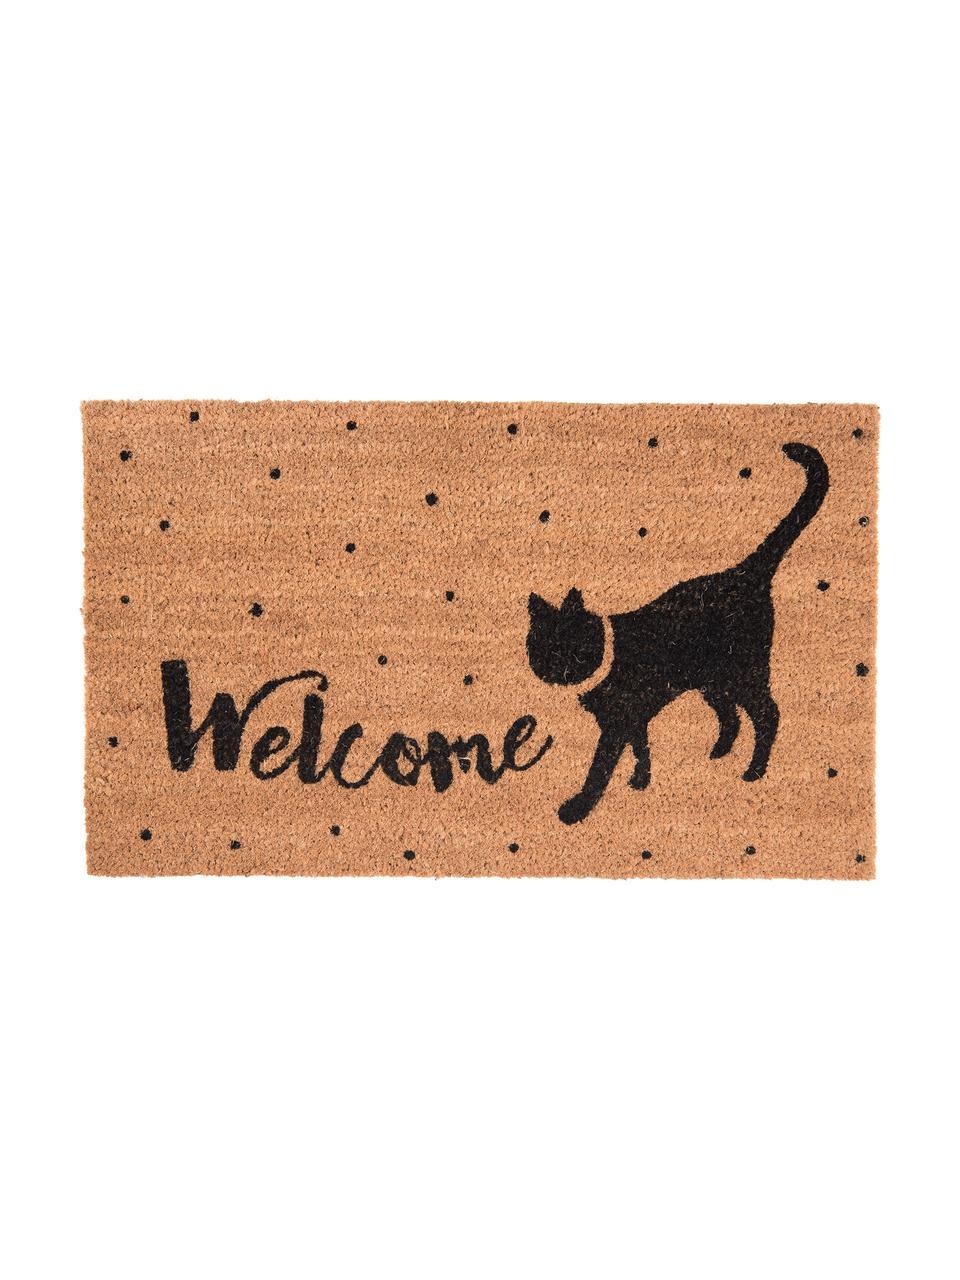 Paillasson WelcomeCat, Brun, noir